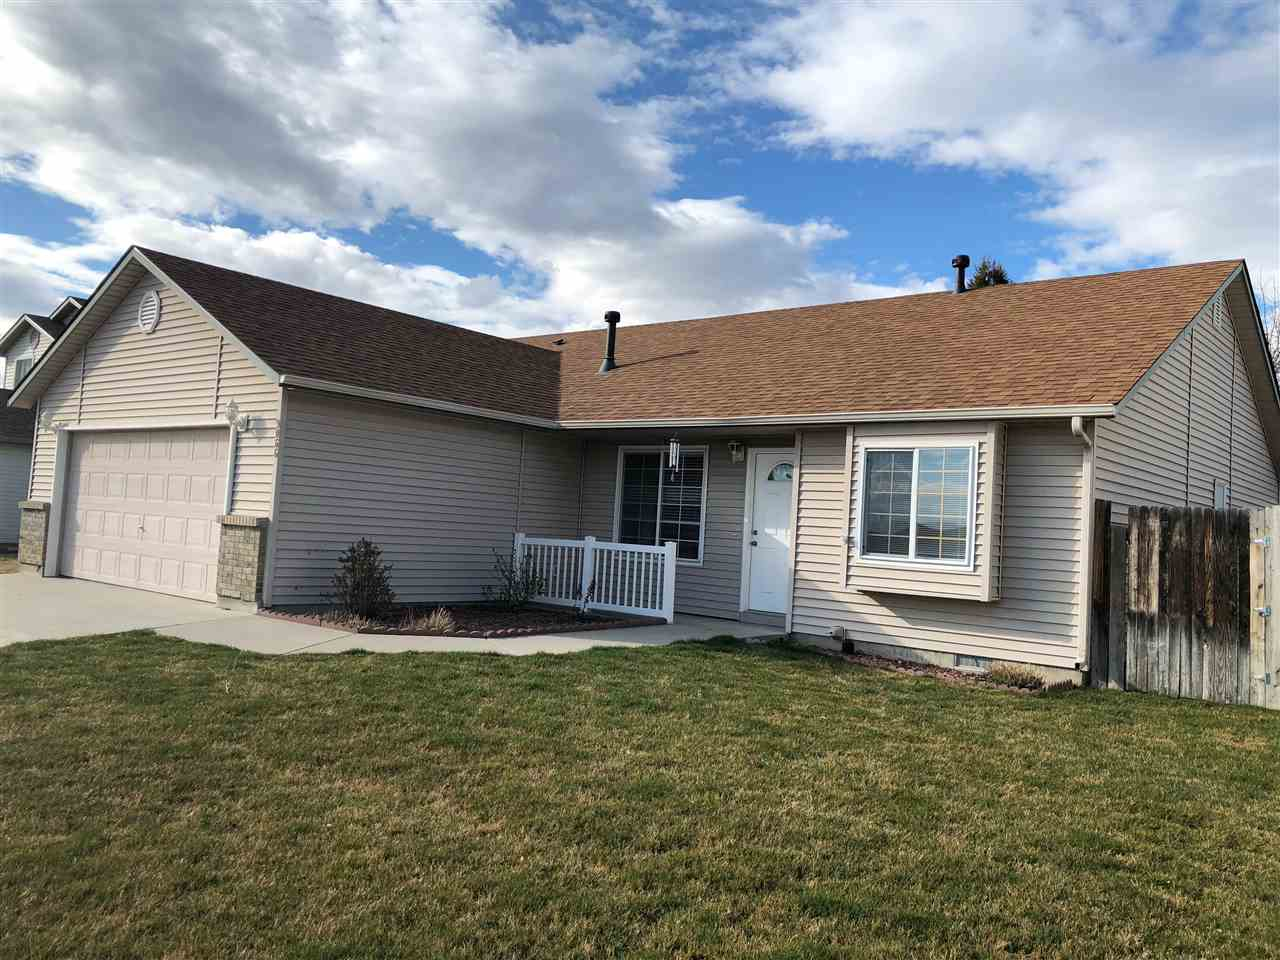 9066 W Cannel Island Pl,Boise,Idaho 83709,3 Bedrooms Bedrooms,2 BathroomsBathrooms,Residential,9066 W Cannel Island Pl,98685698